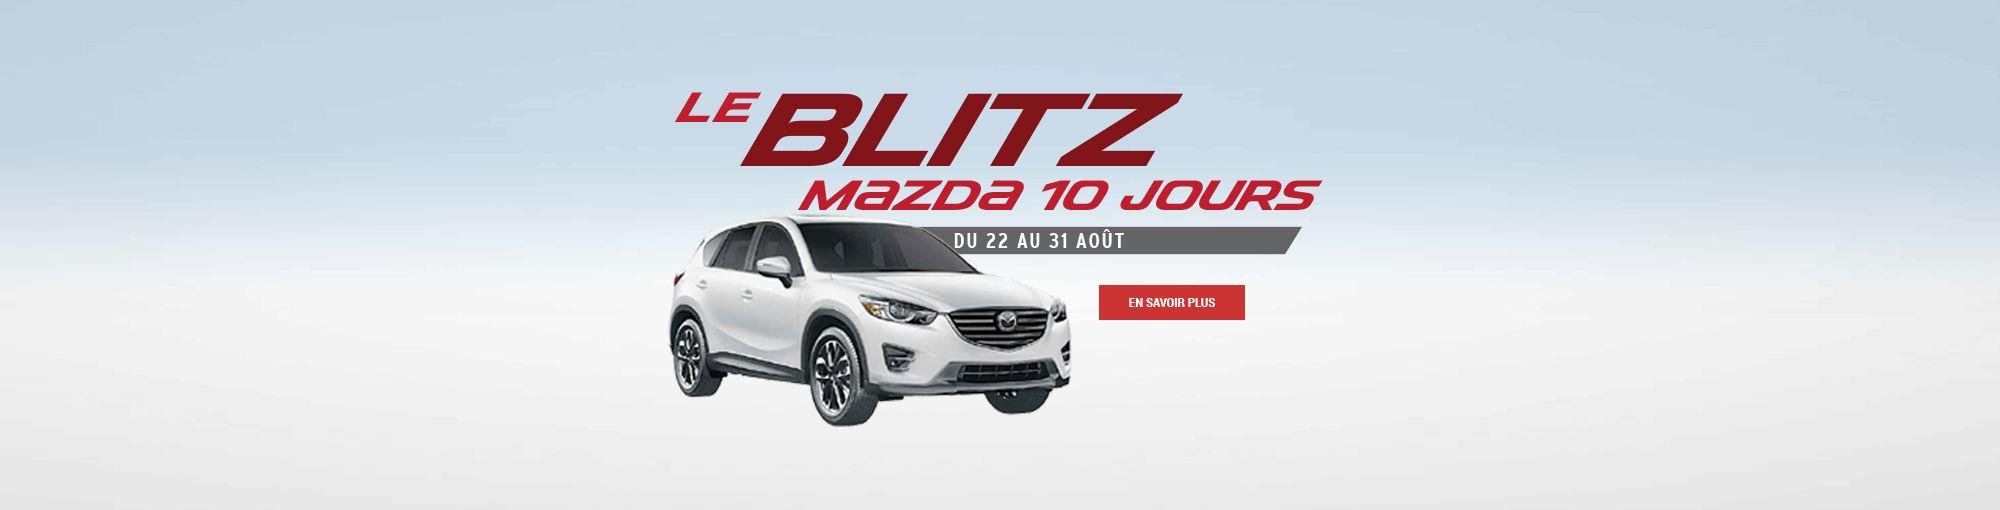 Blitz Mazda 10 jours